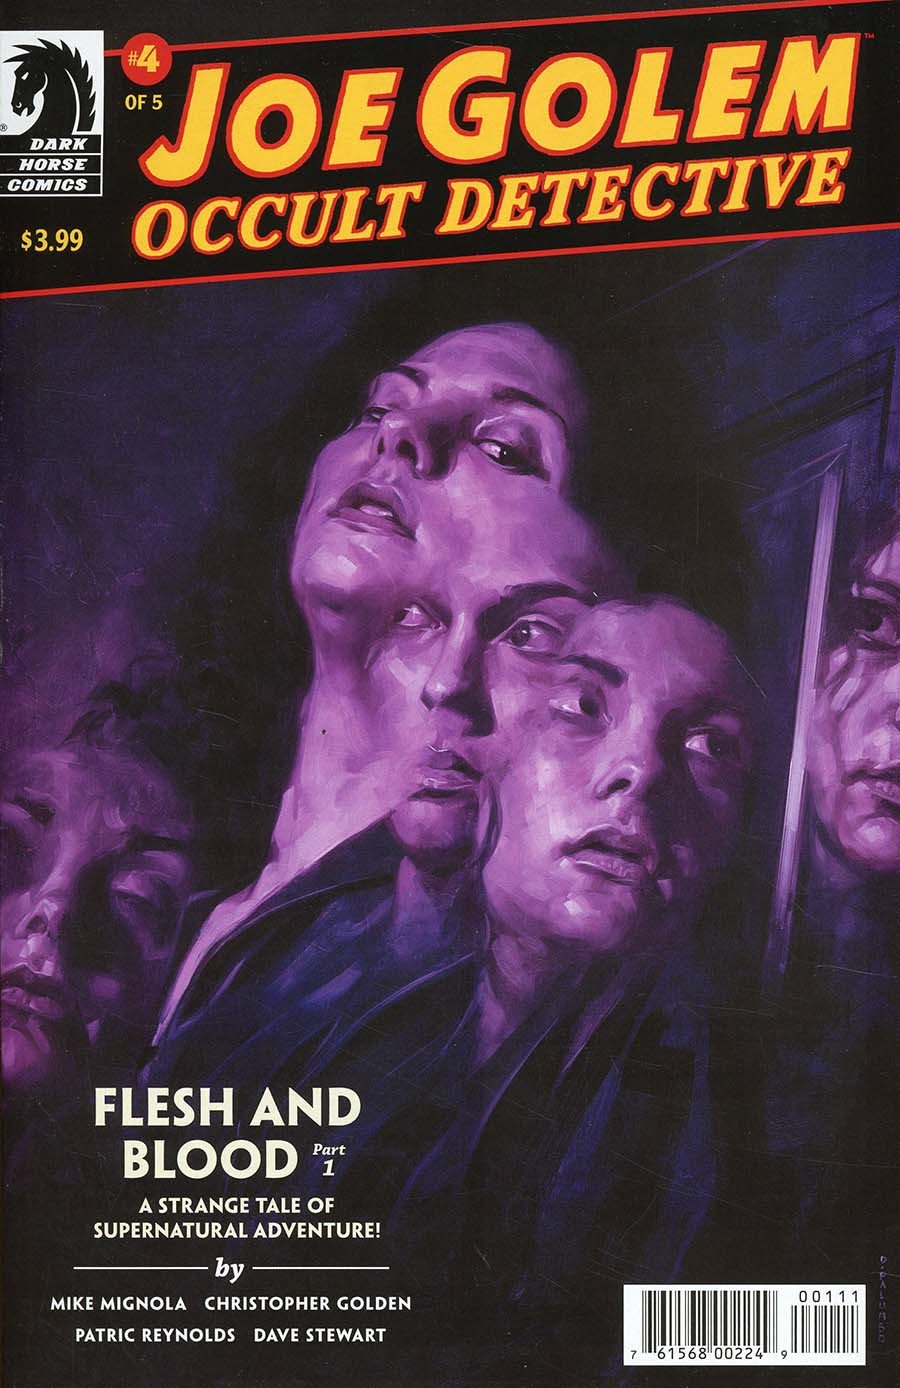 Joe Golem Occult Detective Flesh And Blood #1